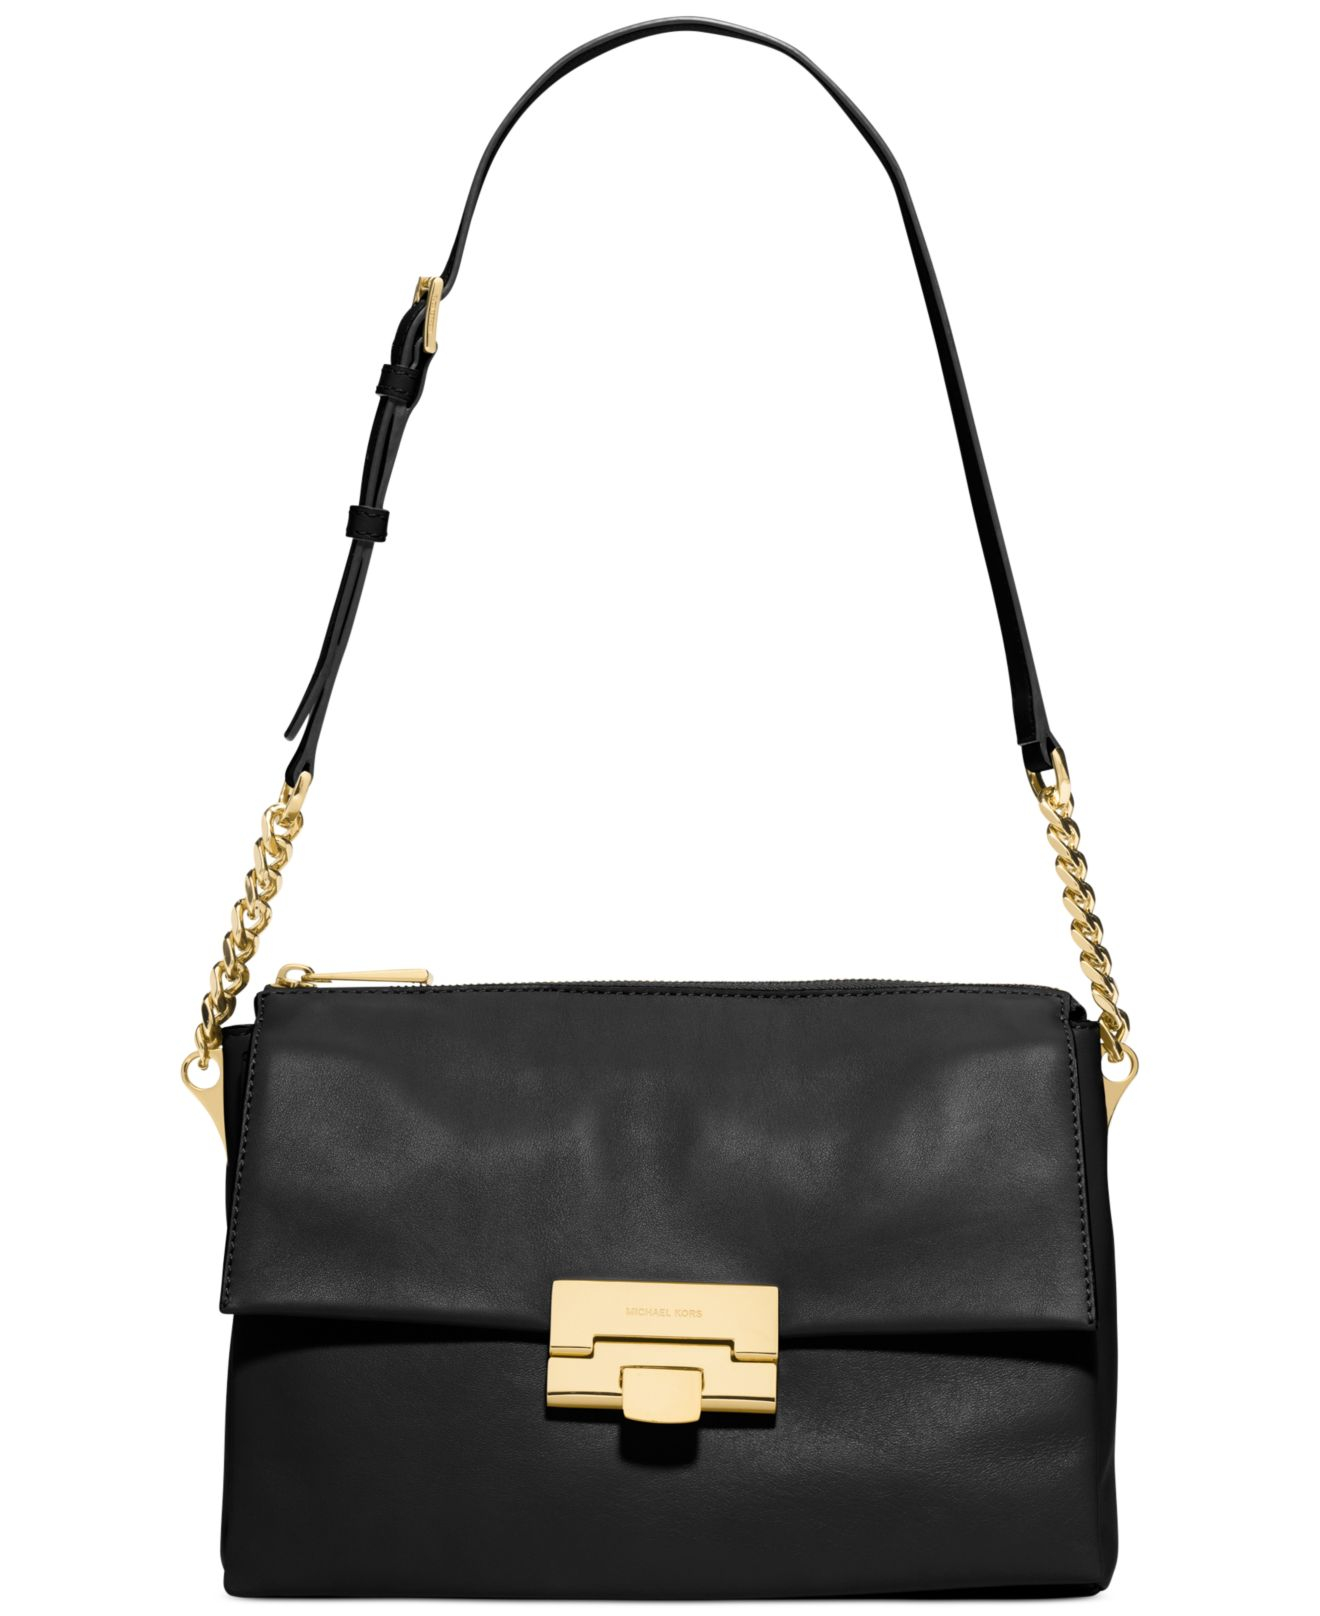 bcadfa3d54cfc3 ... new style lyst michael kors michael karlie large shoulder bag in black  3995a 6495f